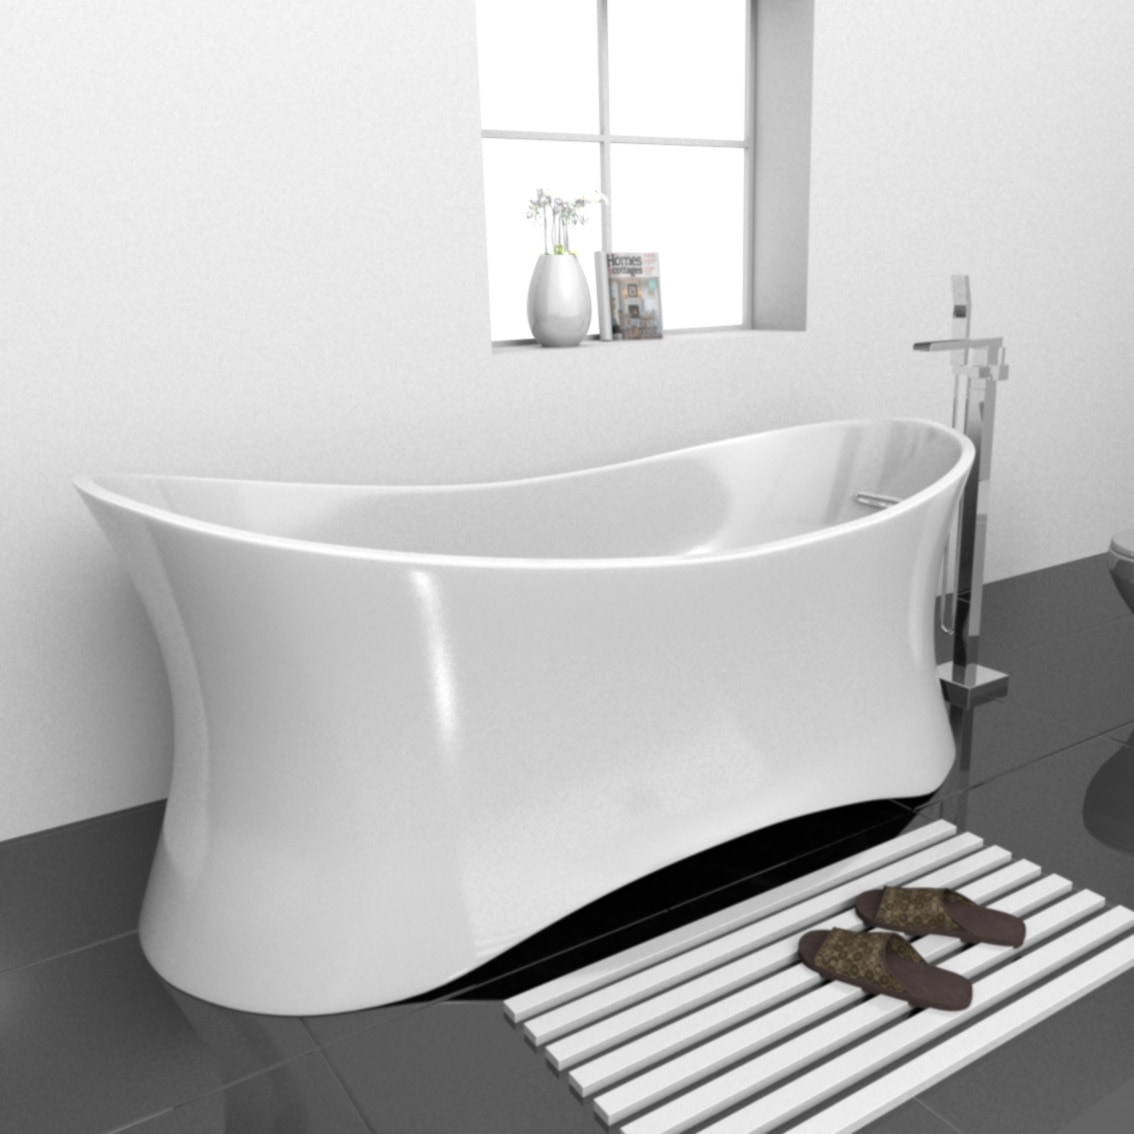 Freestanding Bathtub / 68 x 32 x 30 / High gloss Acrylic / Oval / PALLA Freestanding Bathtub PALLA Freestanding Bathtub 0